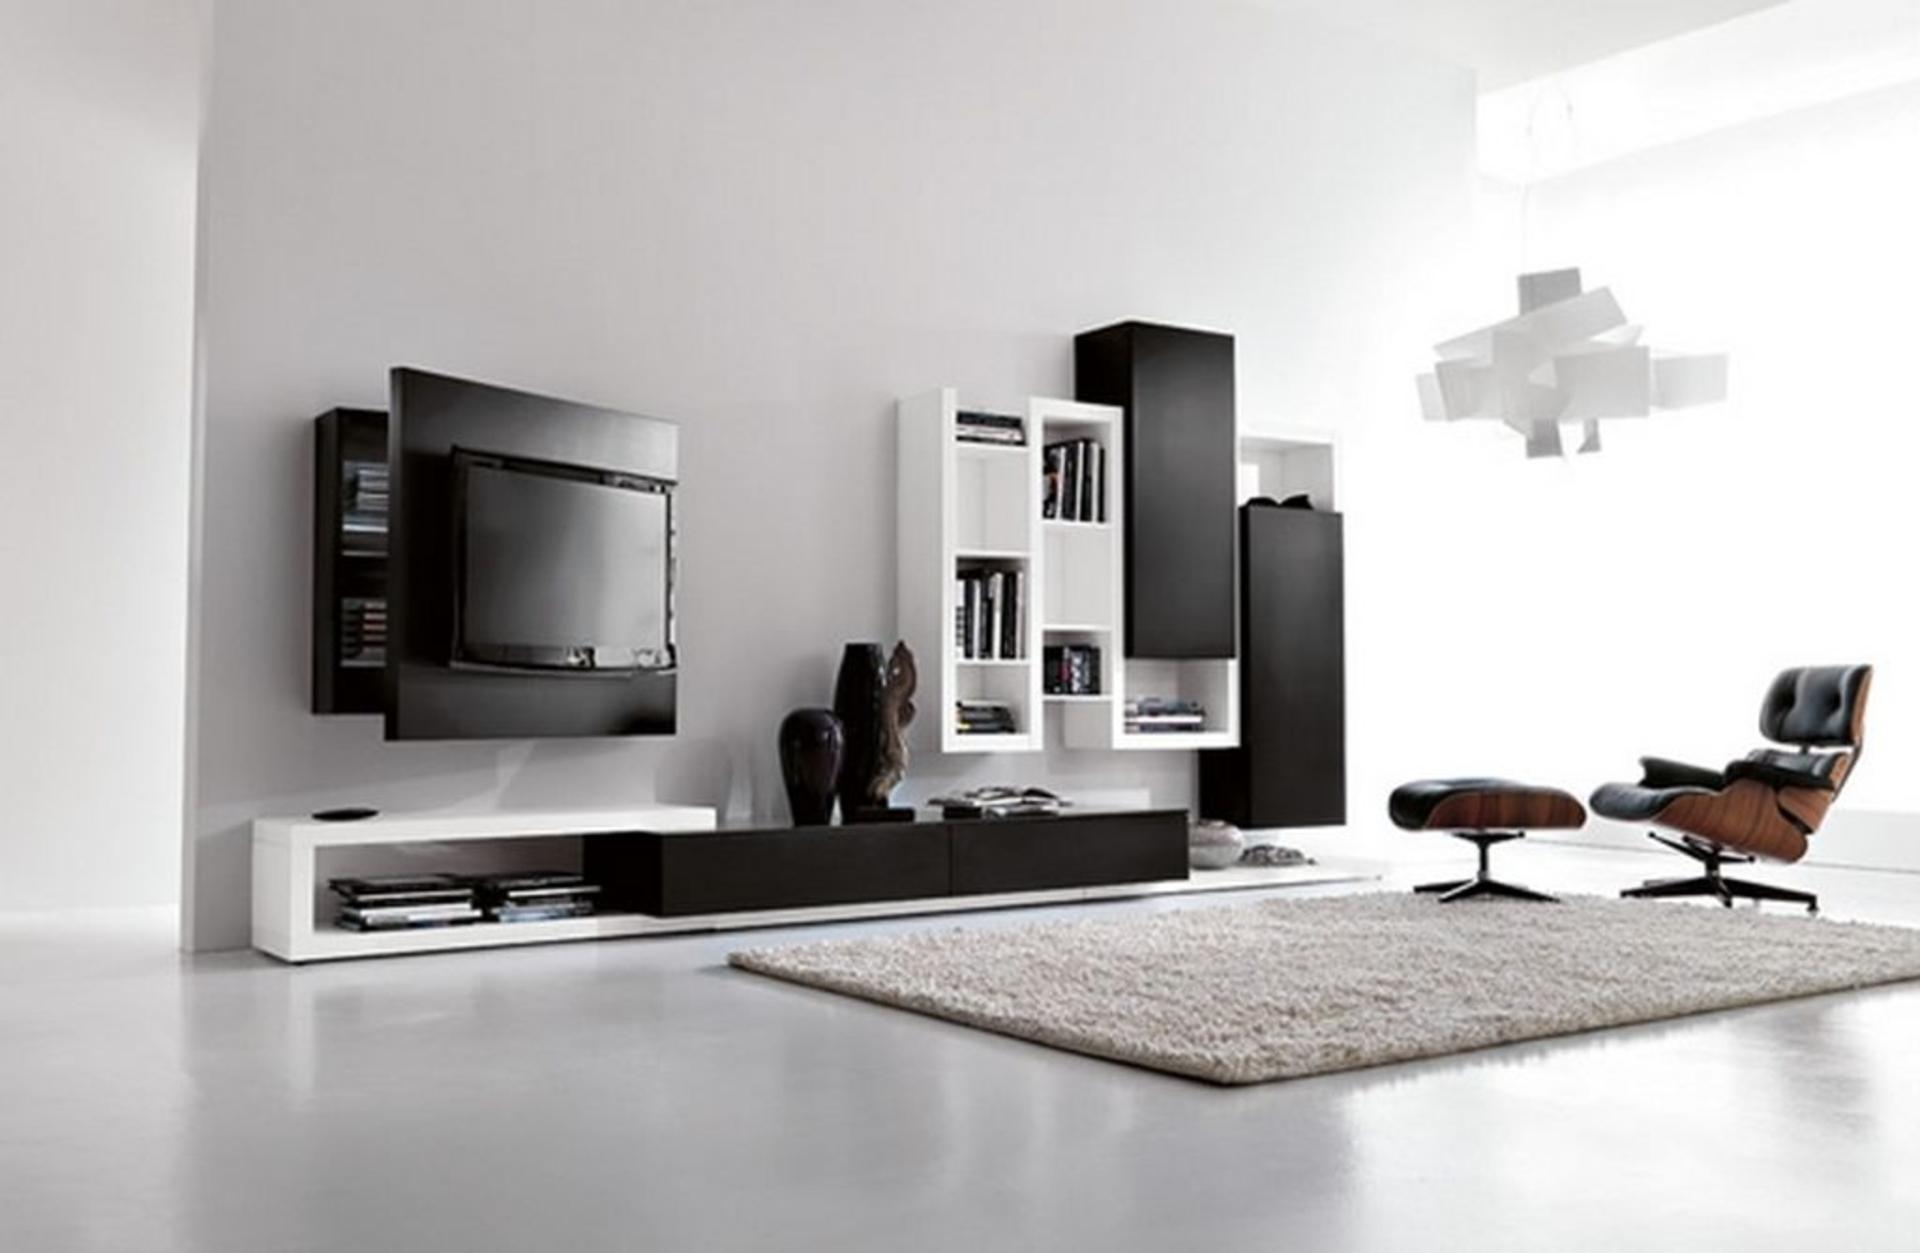 [Tips On How To Arrange Living Room Furniture], Living Room Furniture